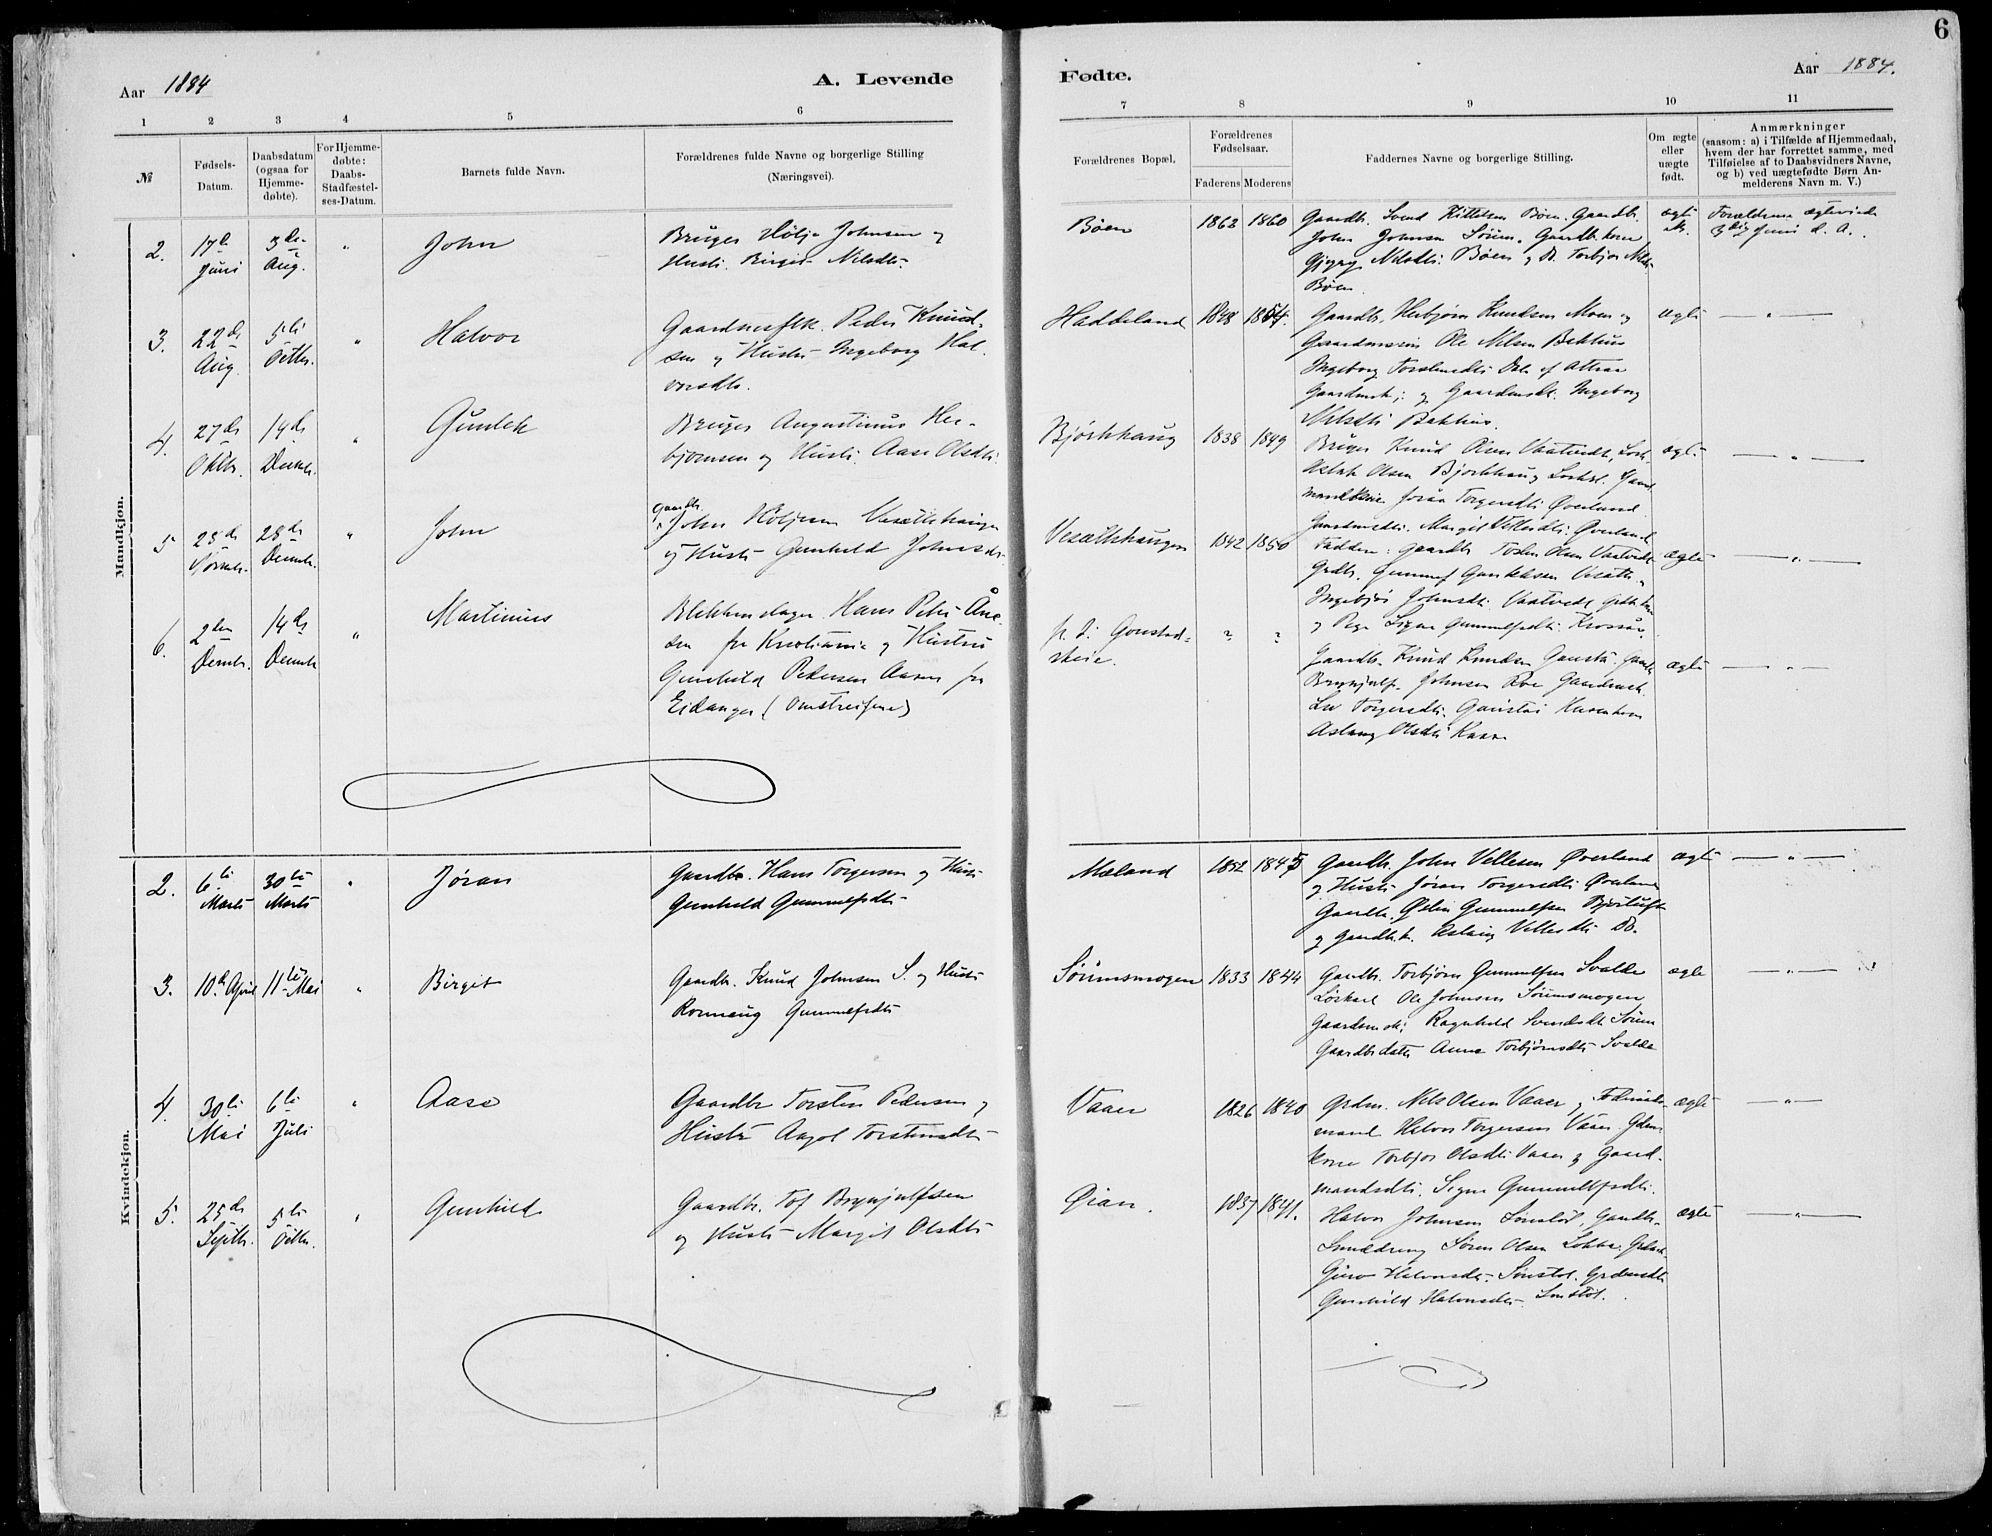 SAKO, Rjukan kirkebøker, F/Fa/L0001: Ministerialbok nr. 1, 1878-1912, s. 6